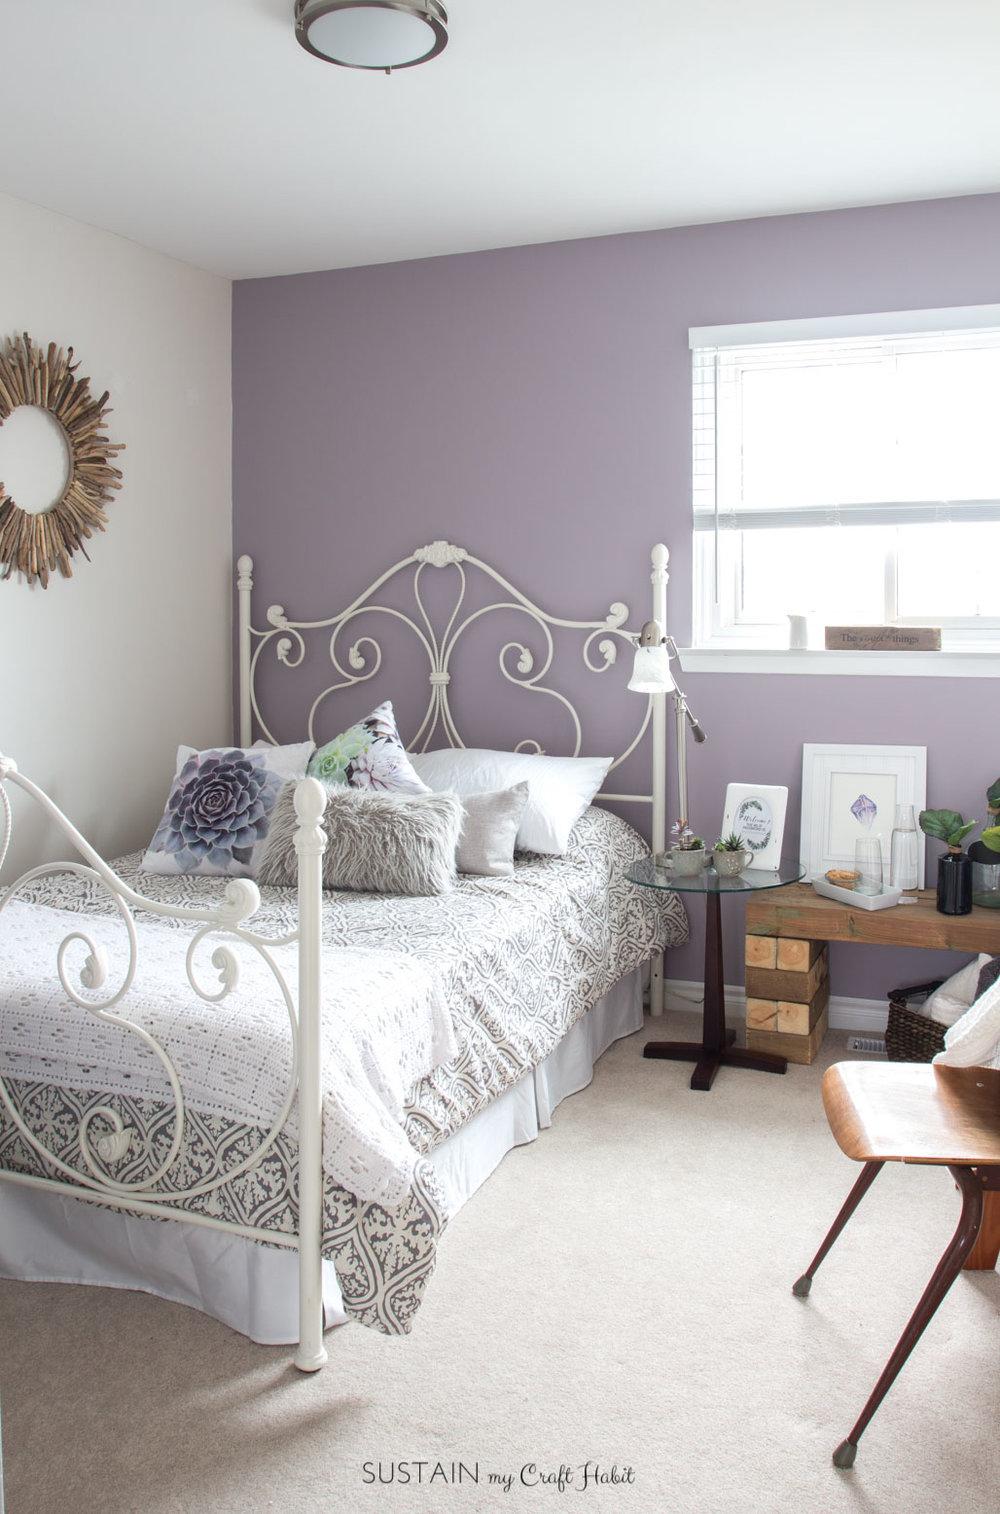 mauve lous guest bedroom ideas a simple spare room refresh u2013 diy